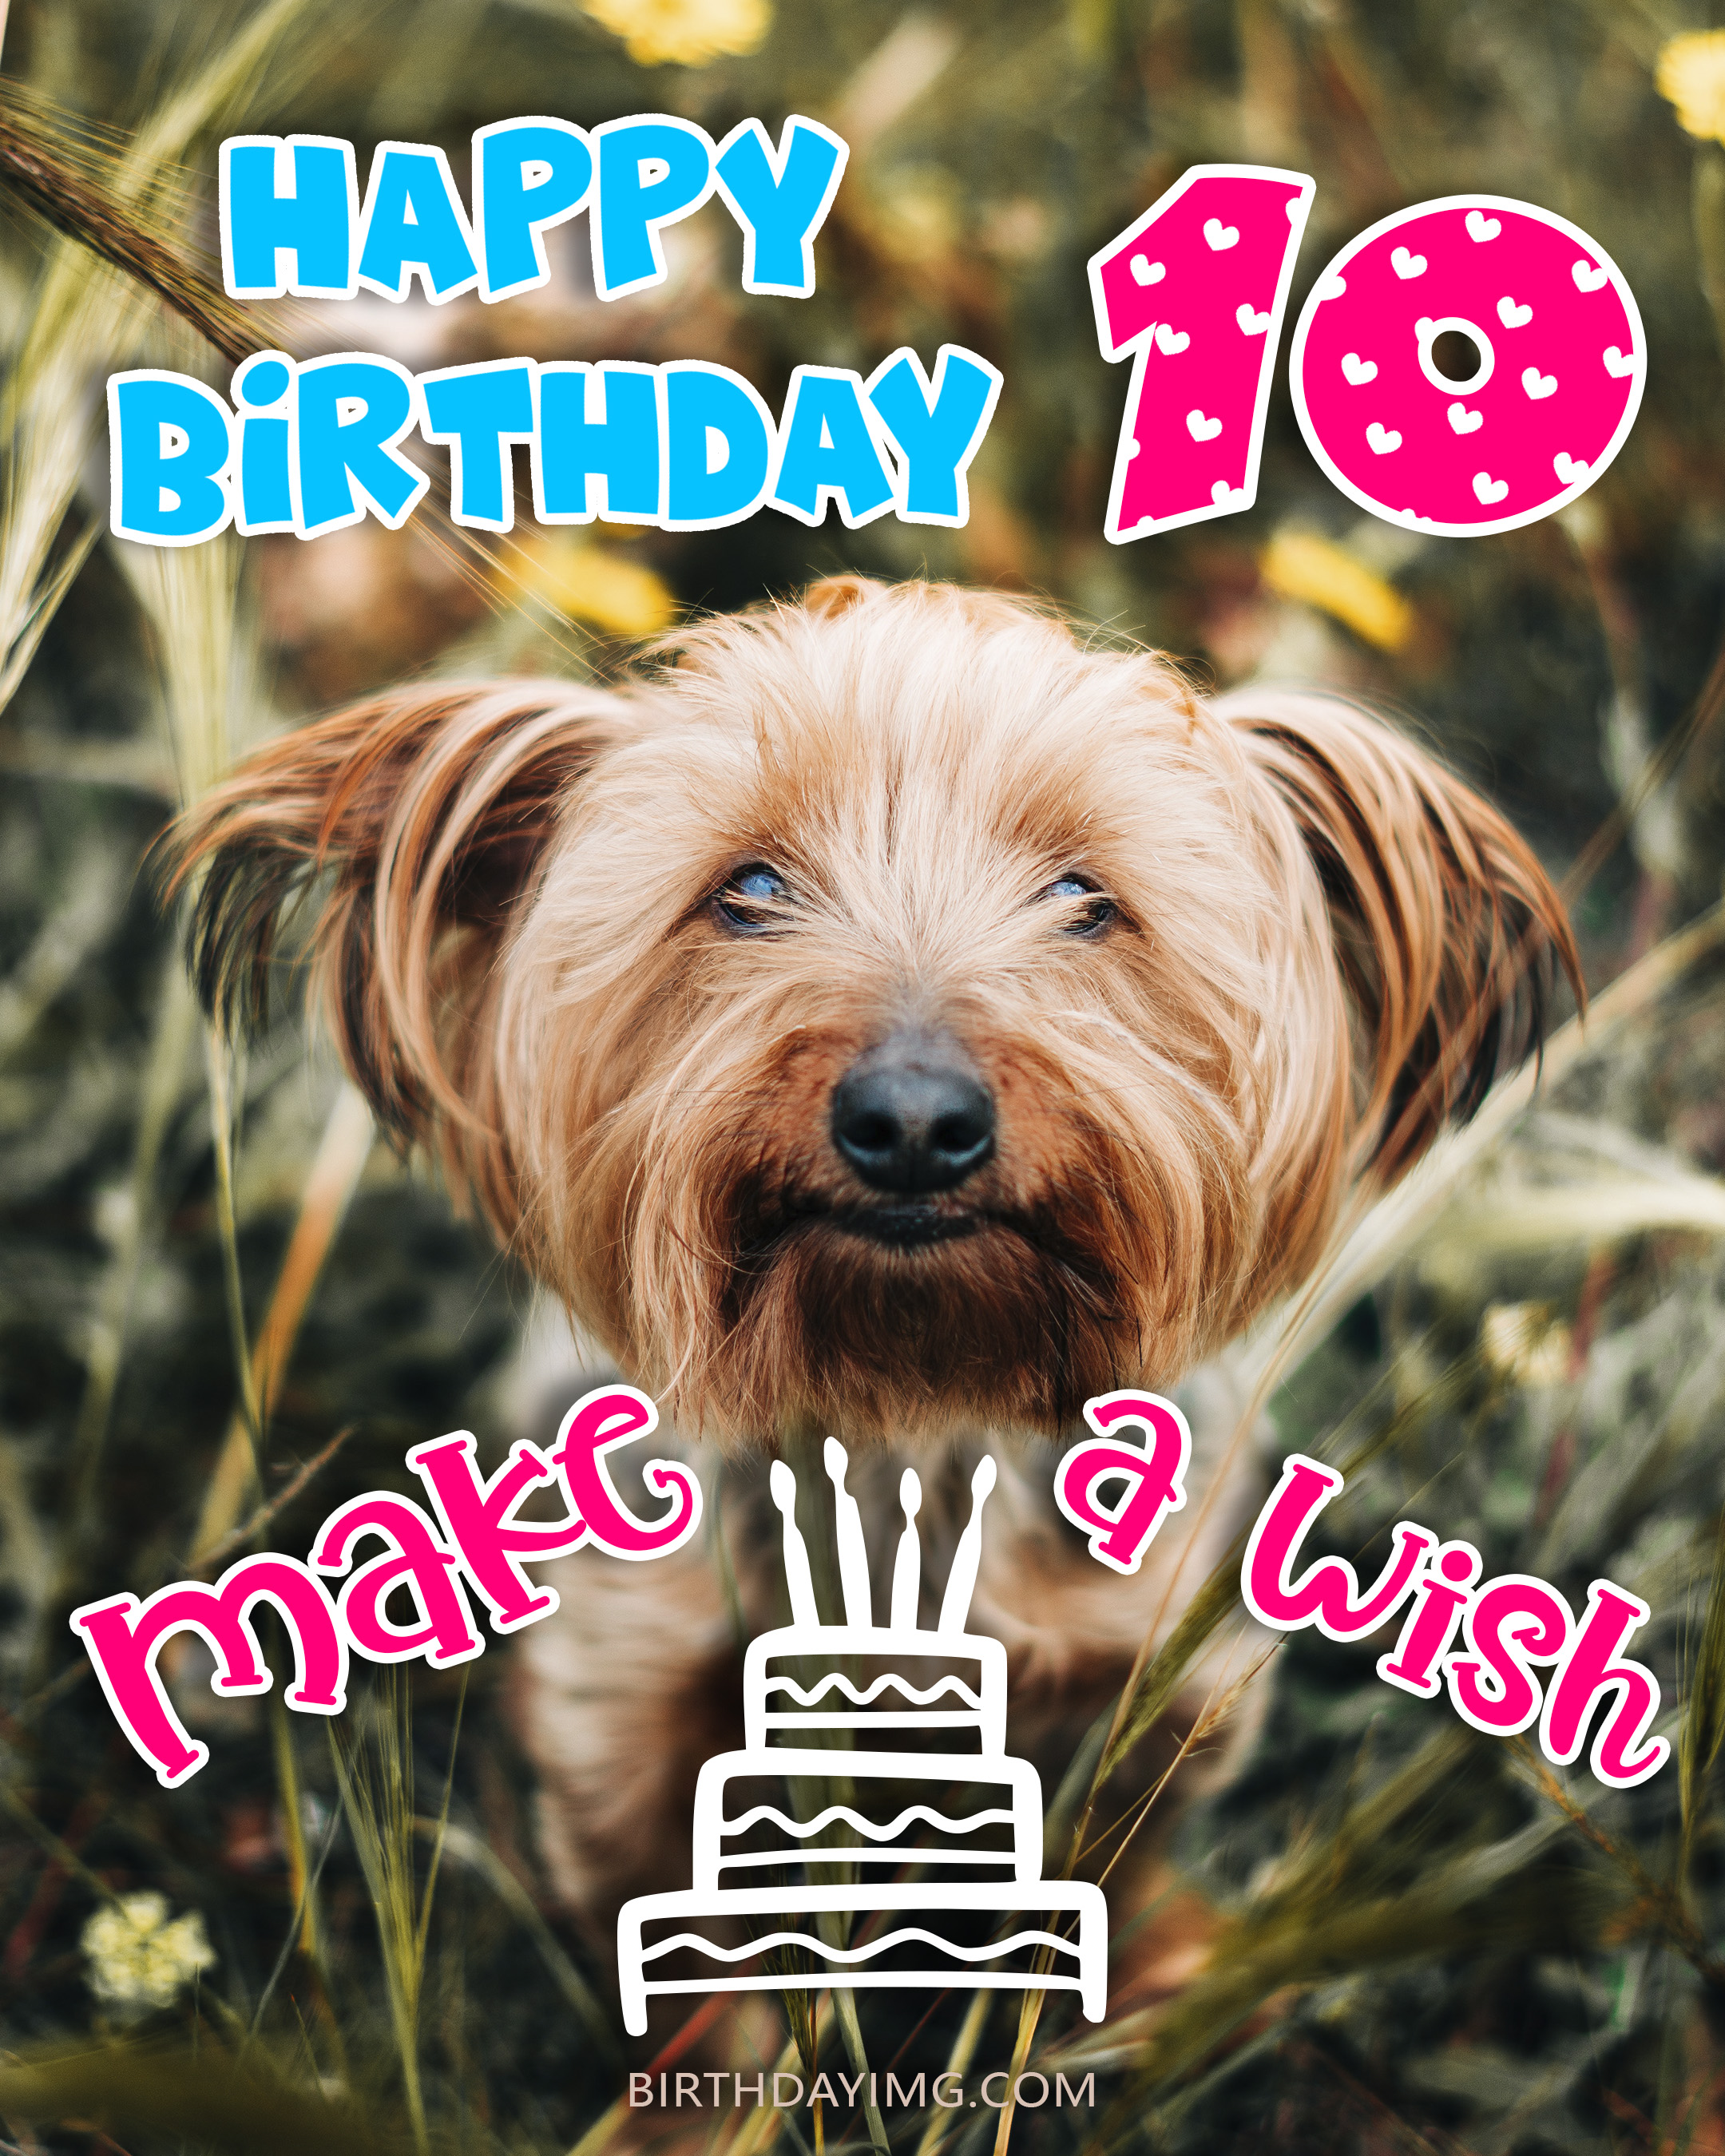 Free 10th Years Happy Birthday Image With Cute Dog and Cake - birthdayimg.com